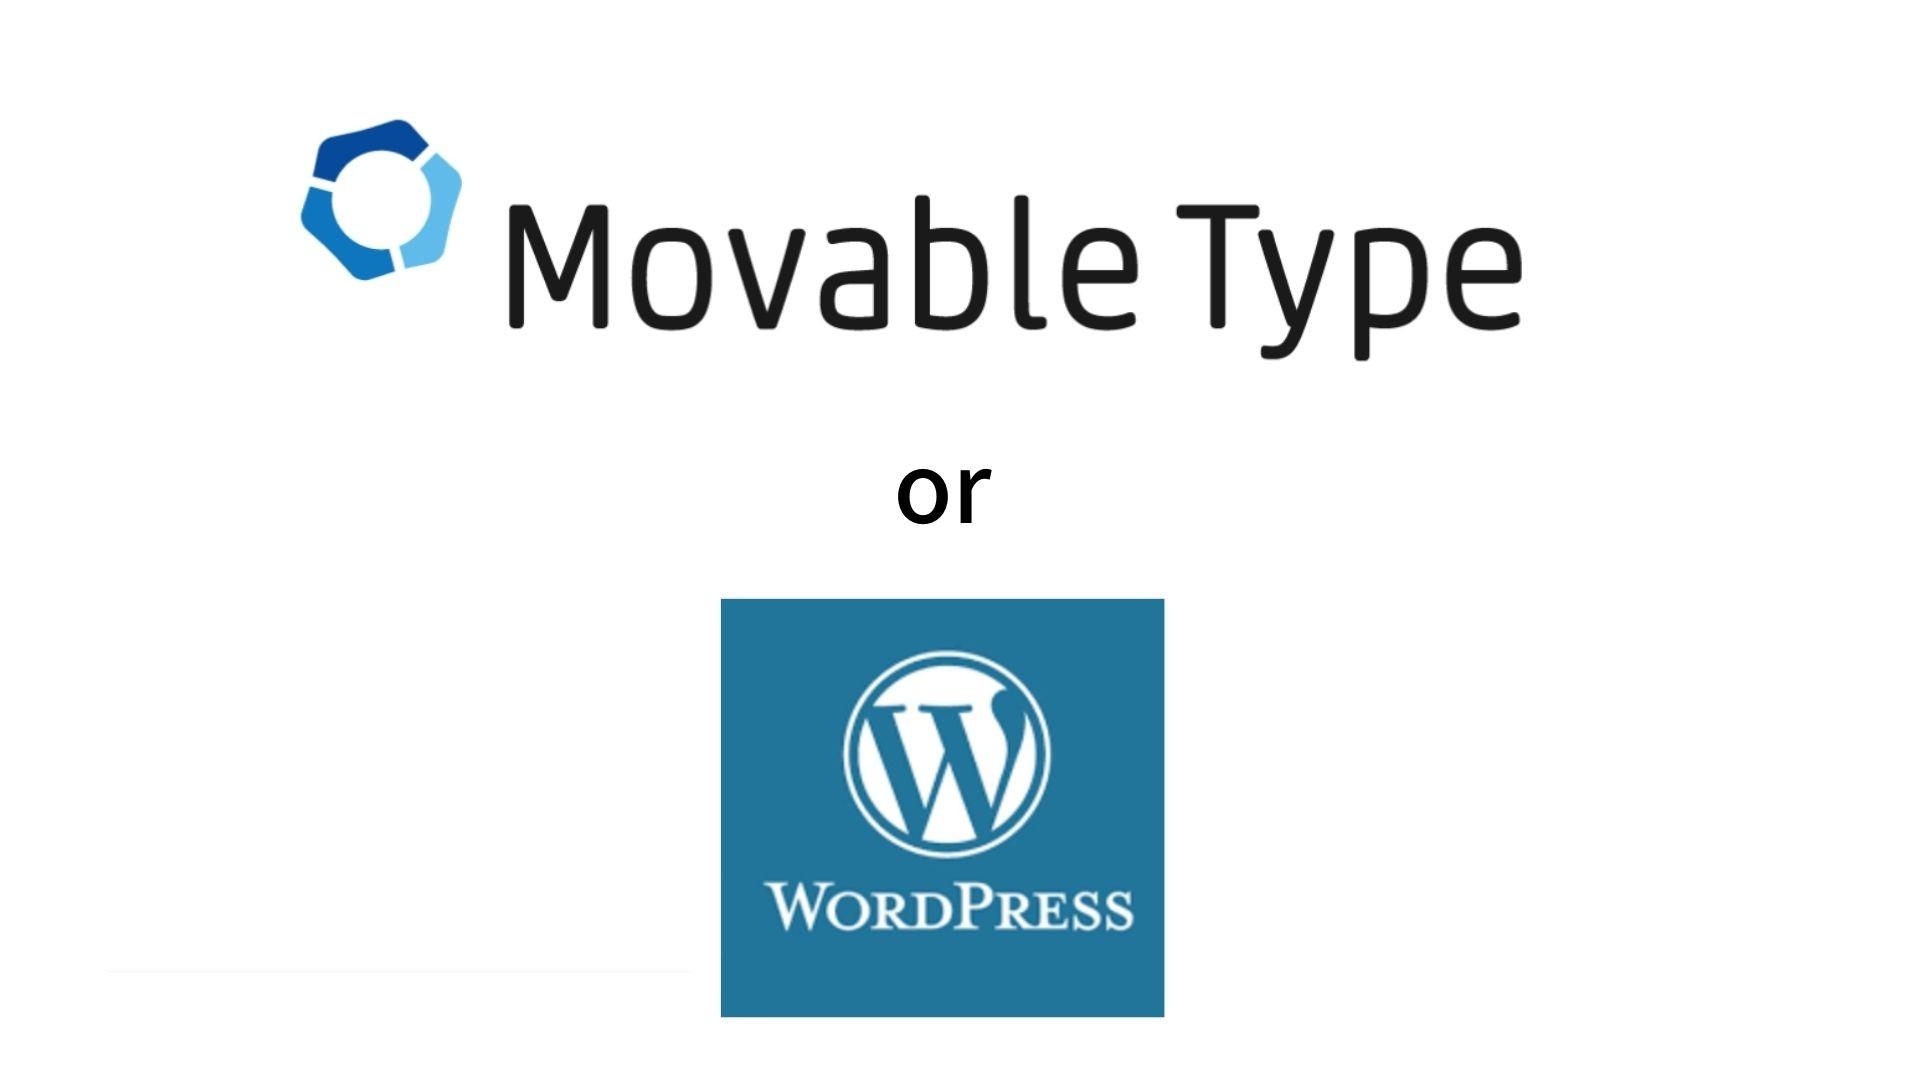 WordPressとMovableTypeを比較!CMSの違いをプロが徹底解説